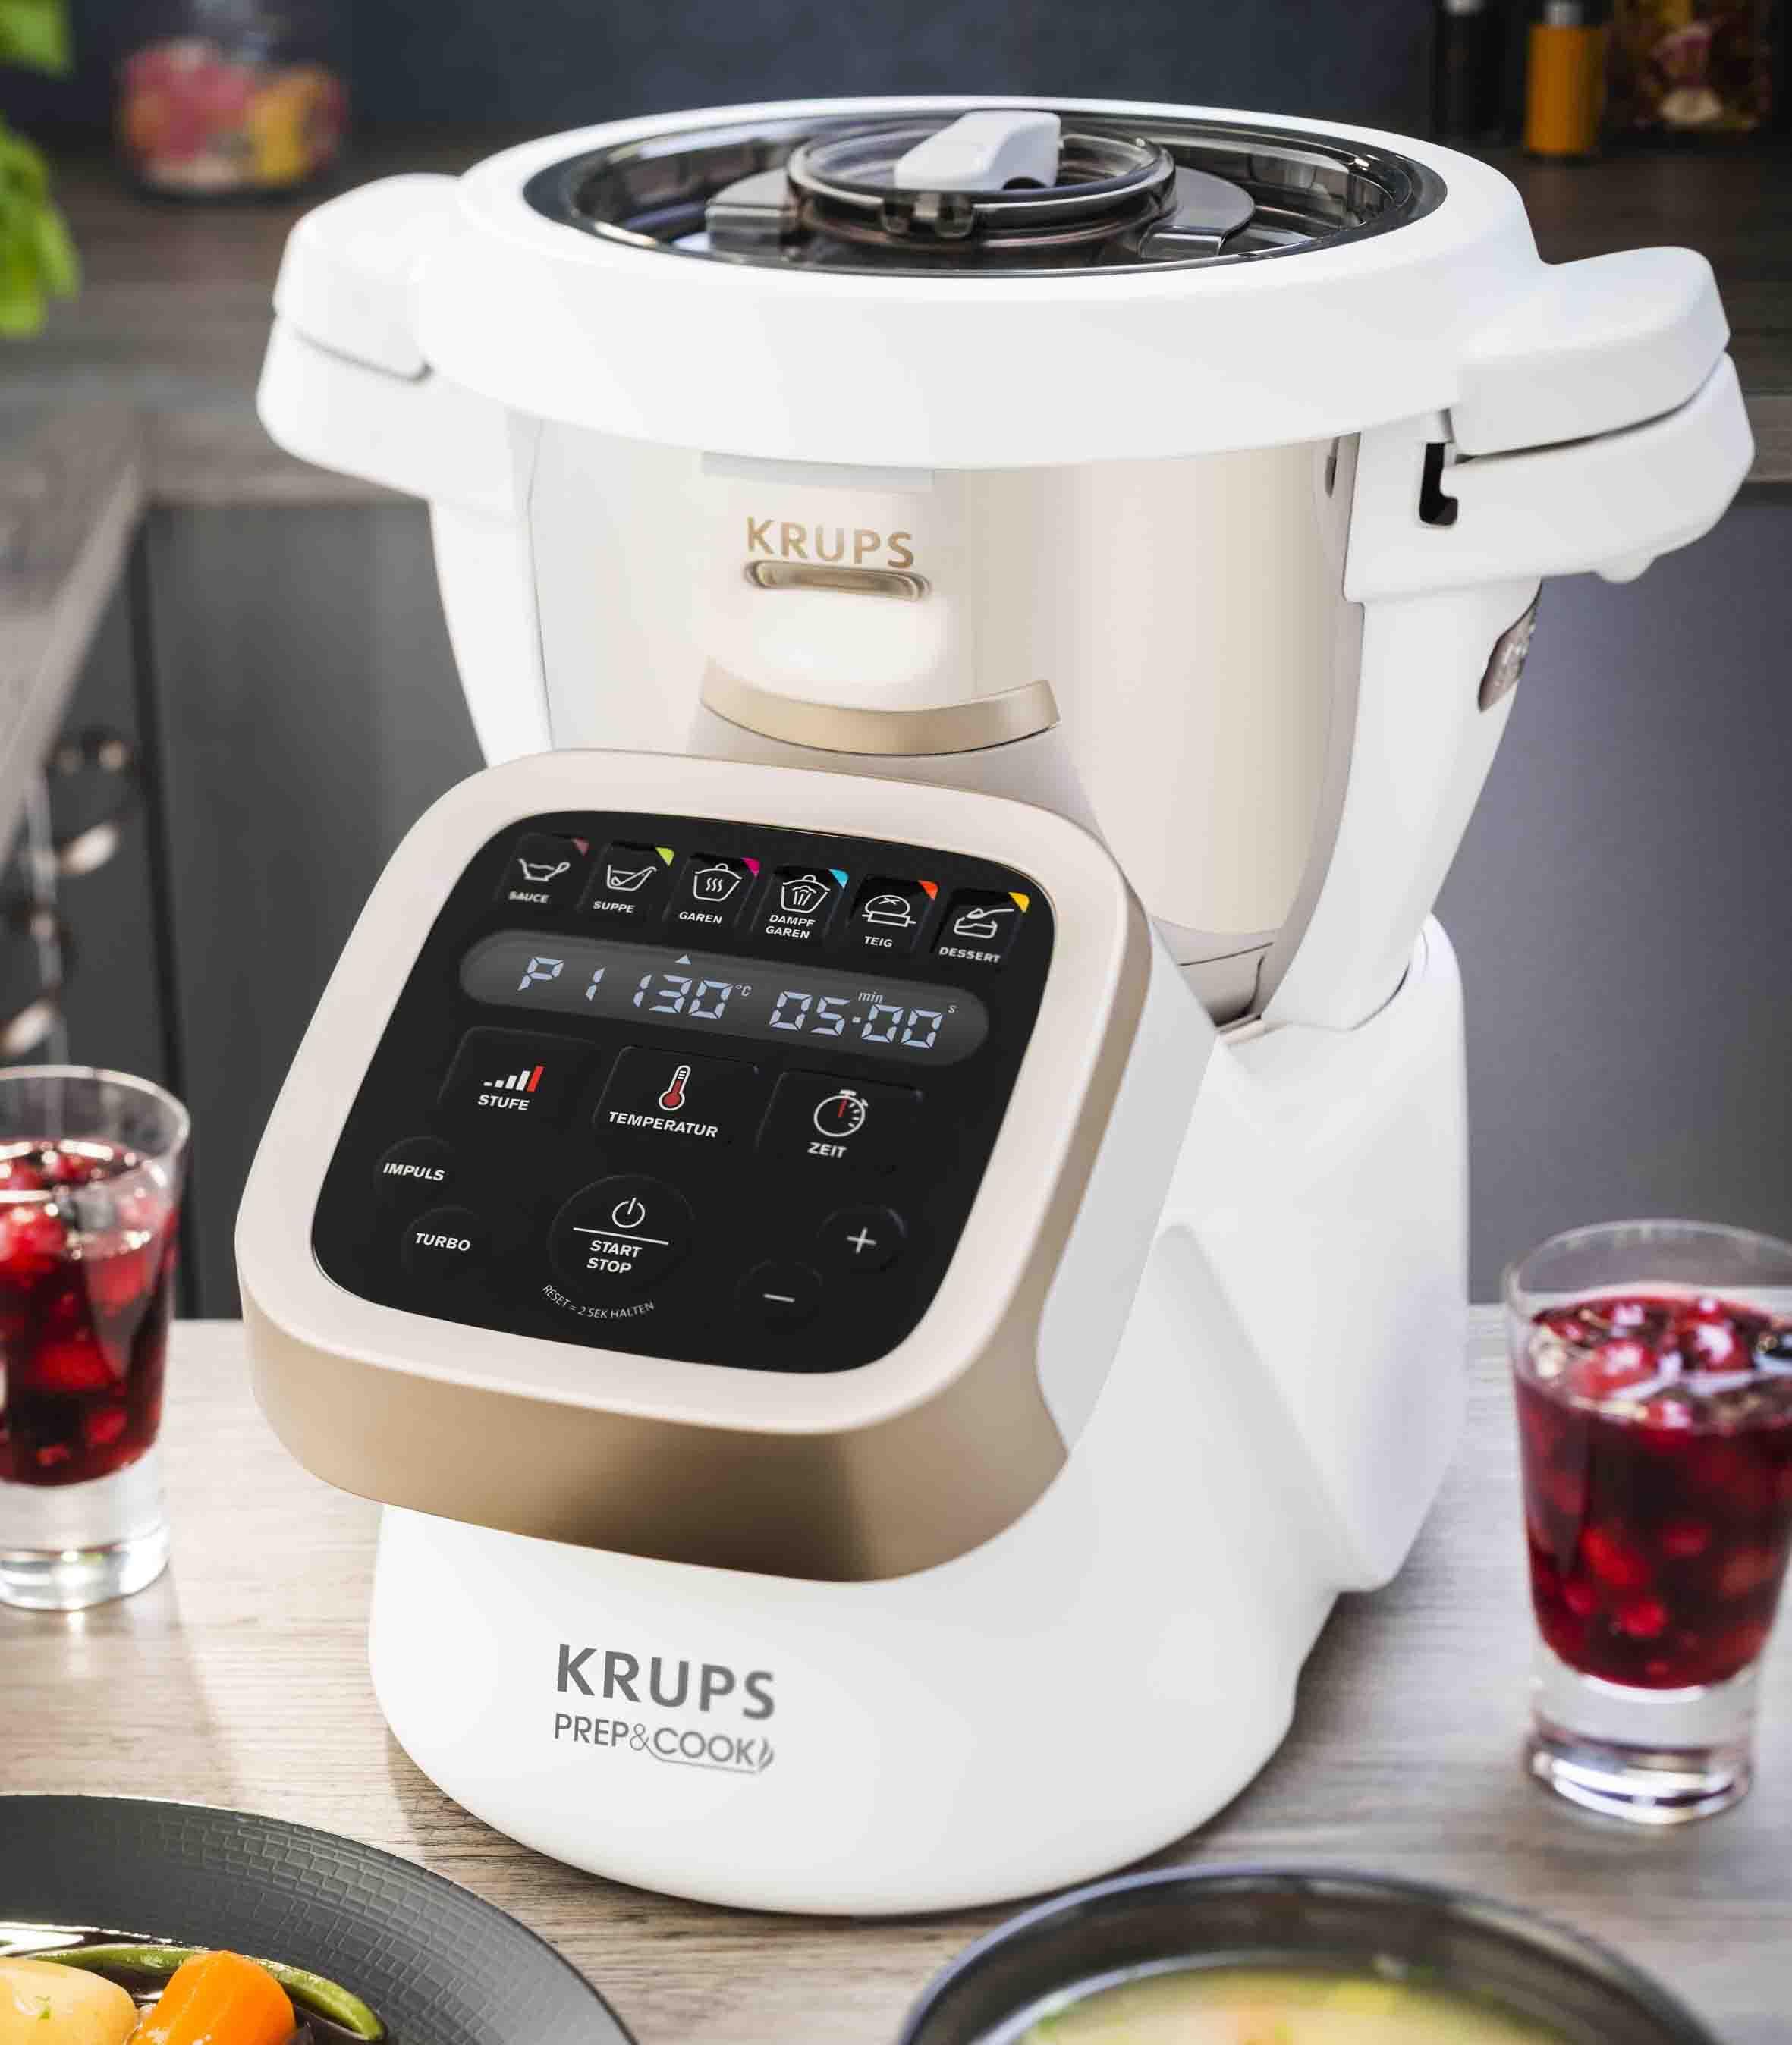 Krups Küchenmaschine Prep & Cook HP5031 – Schneiden, Mixen, Kochen